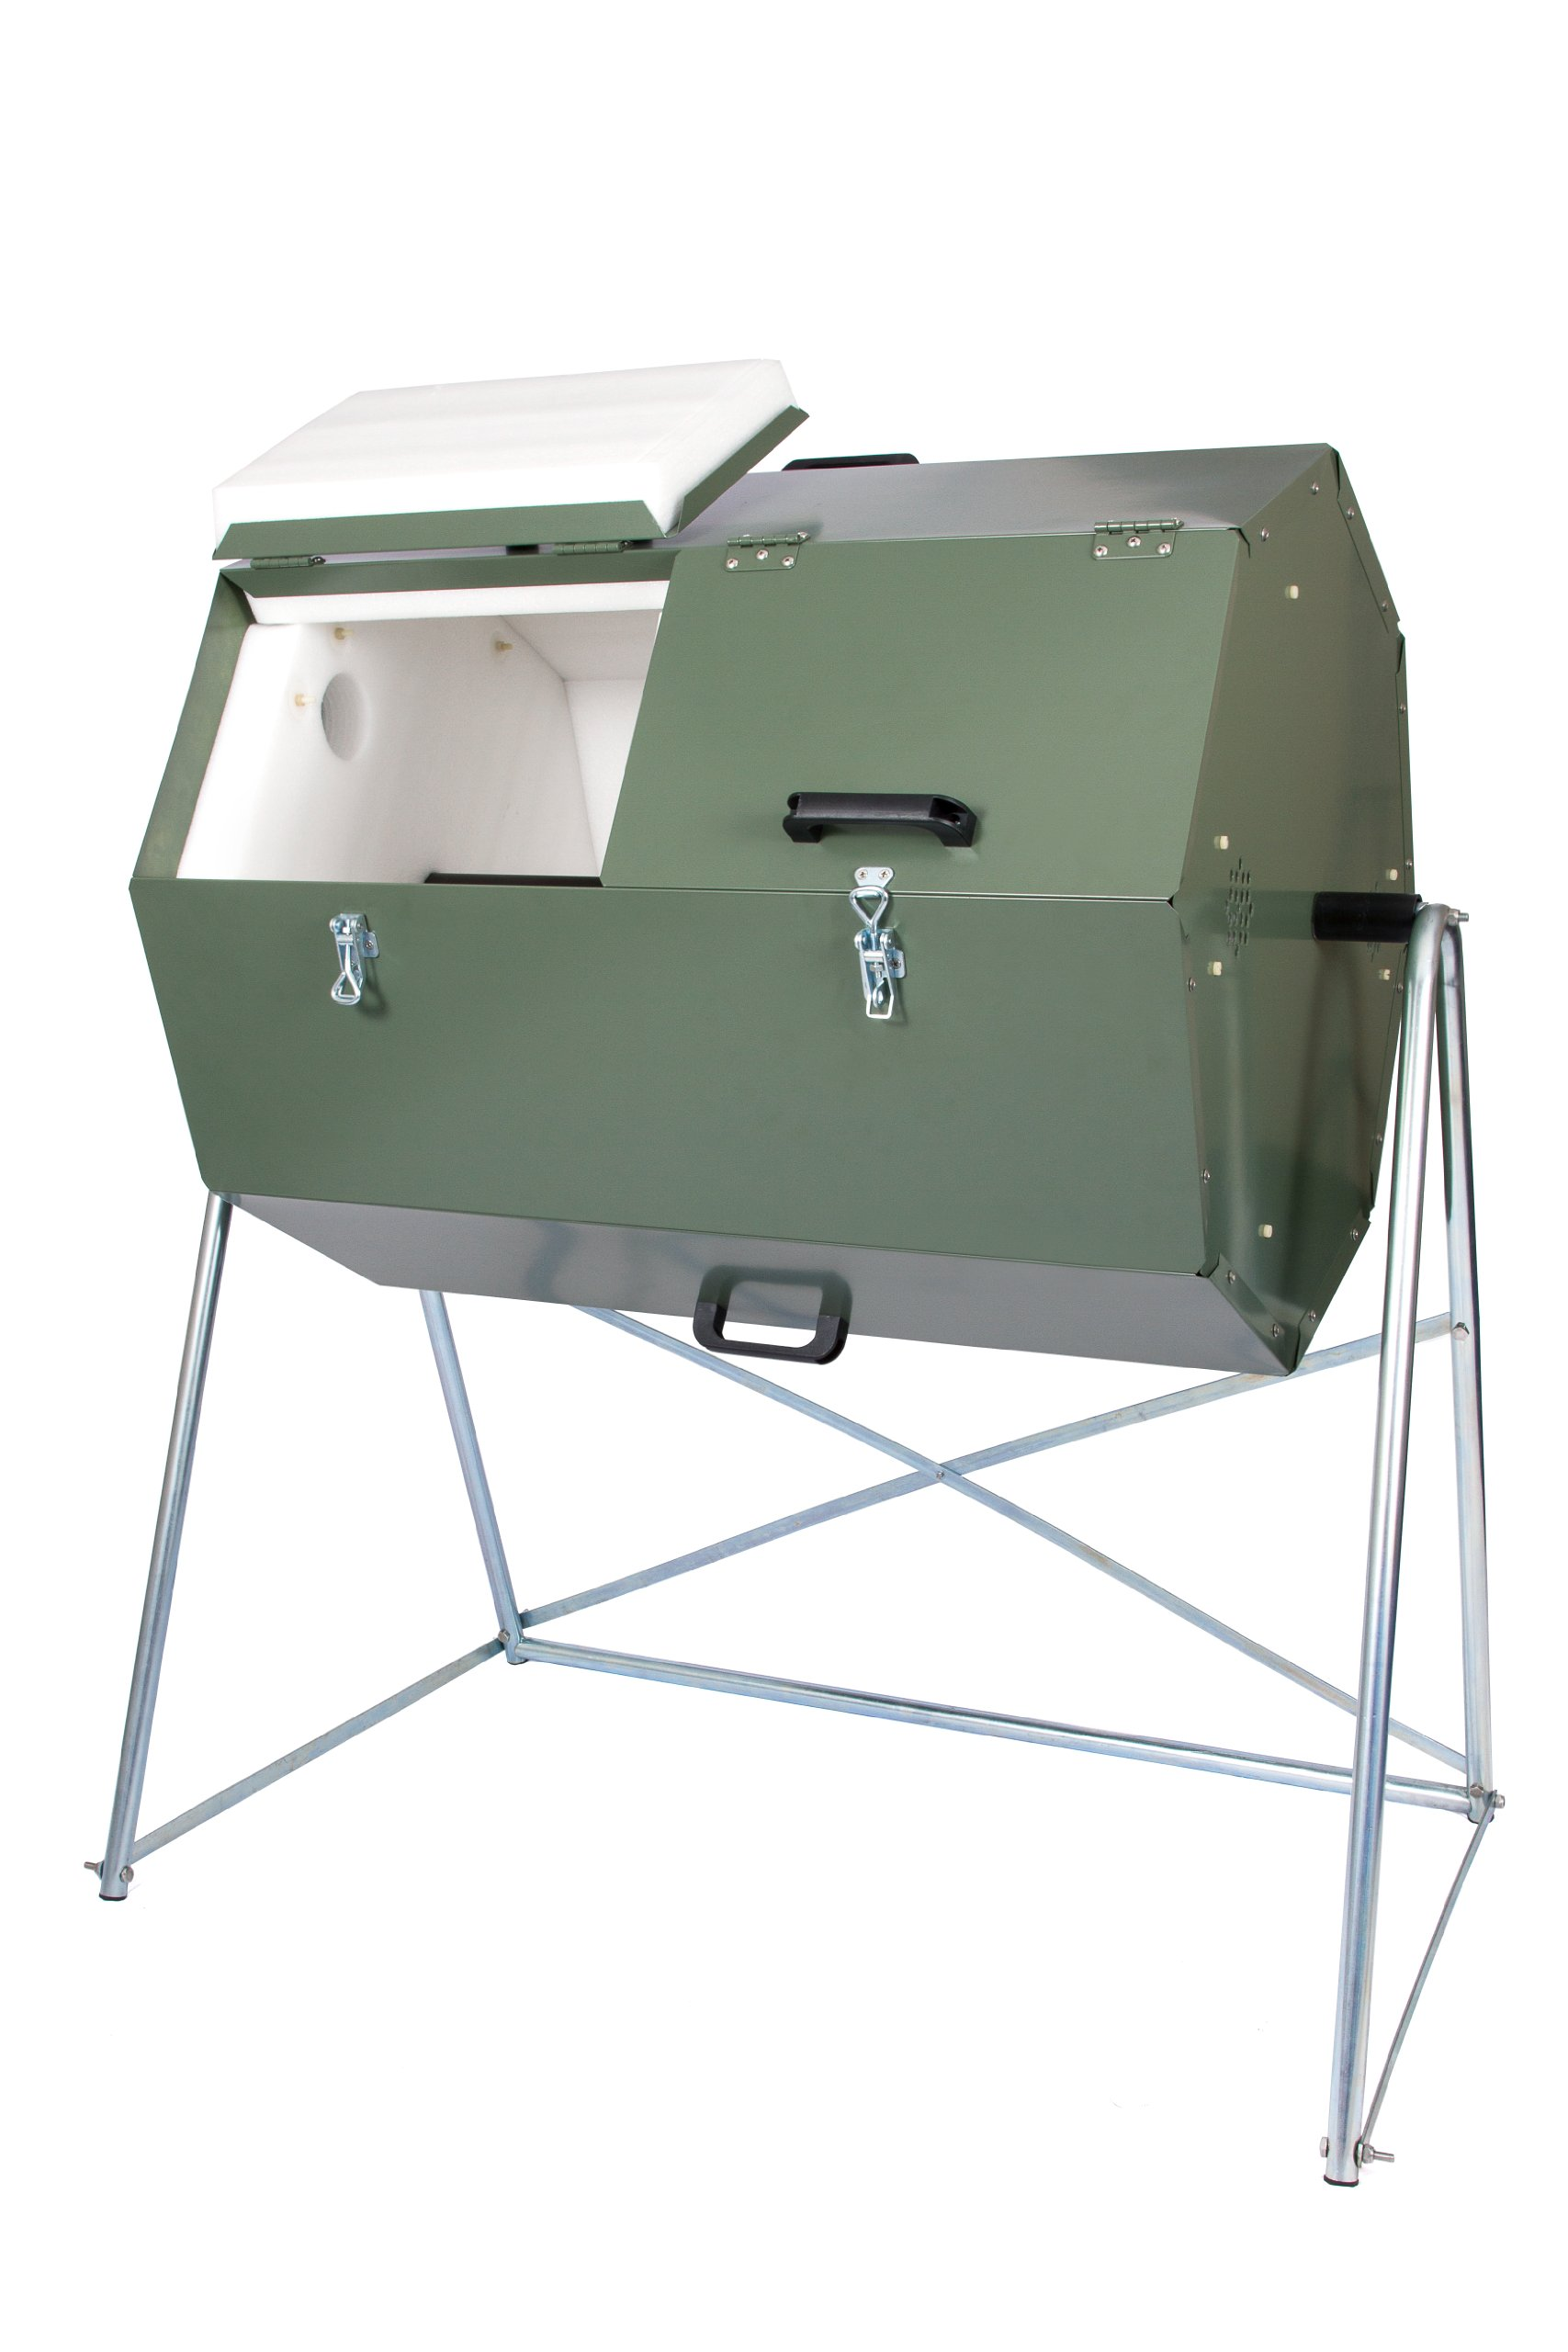 Jora Composter Tumbler JK270 by Jora Composter